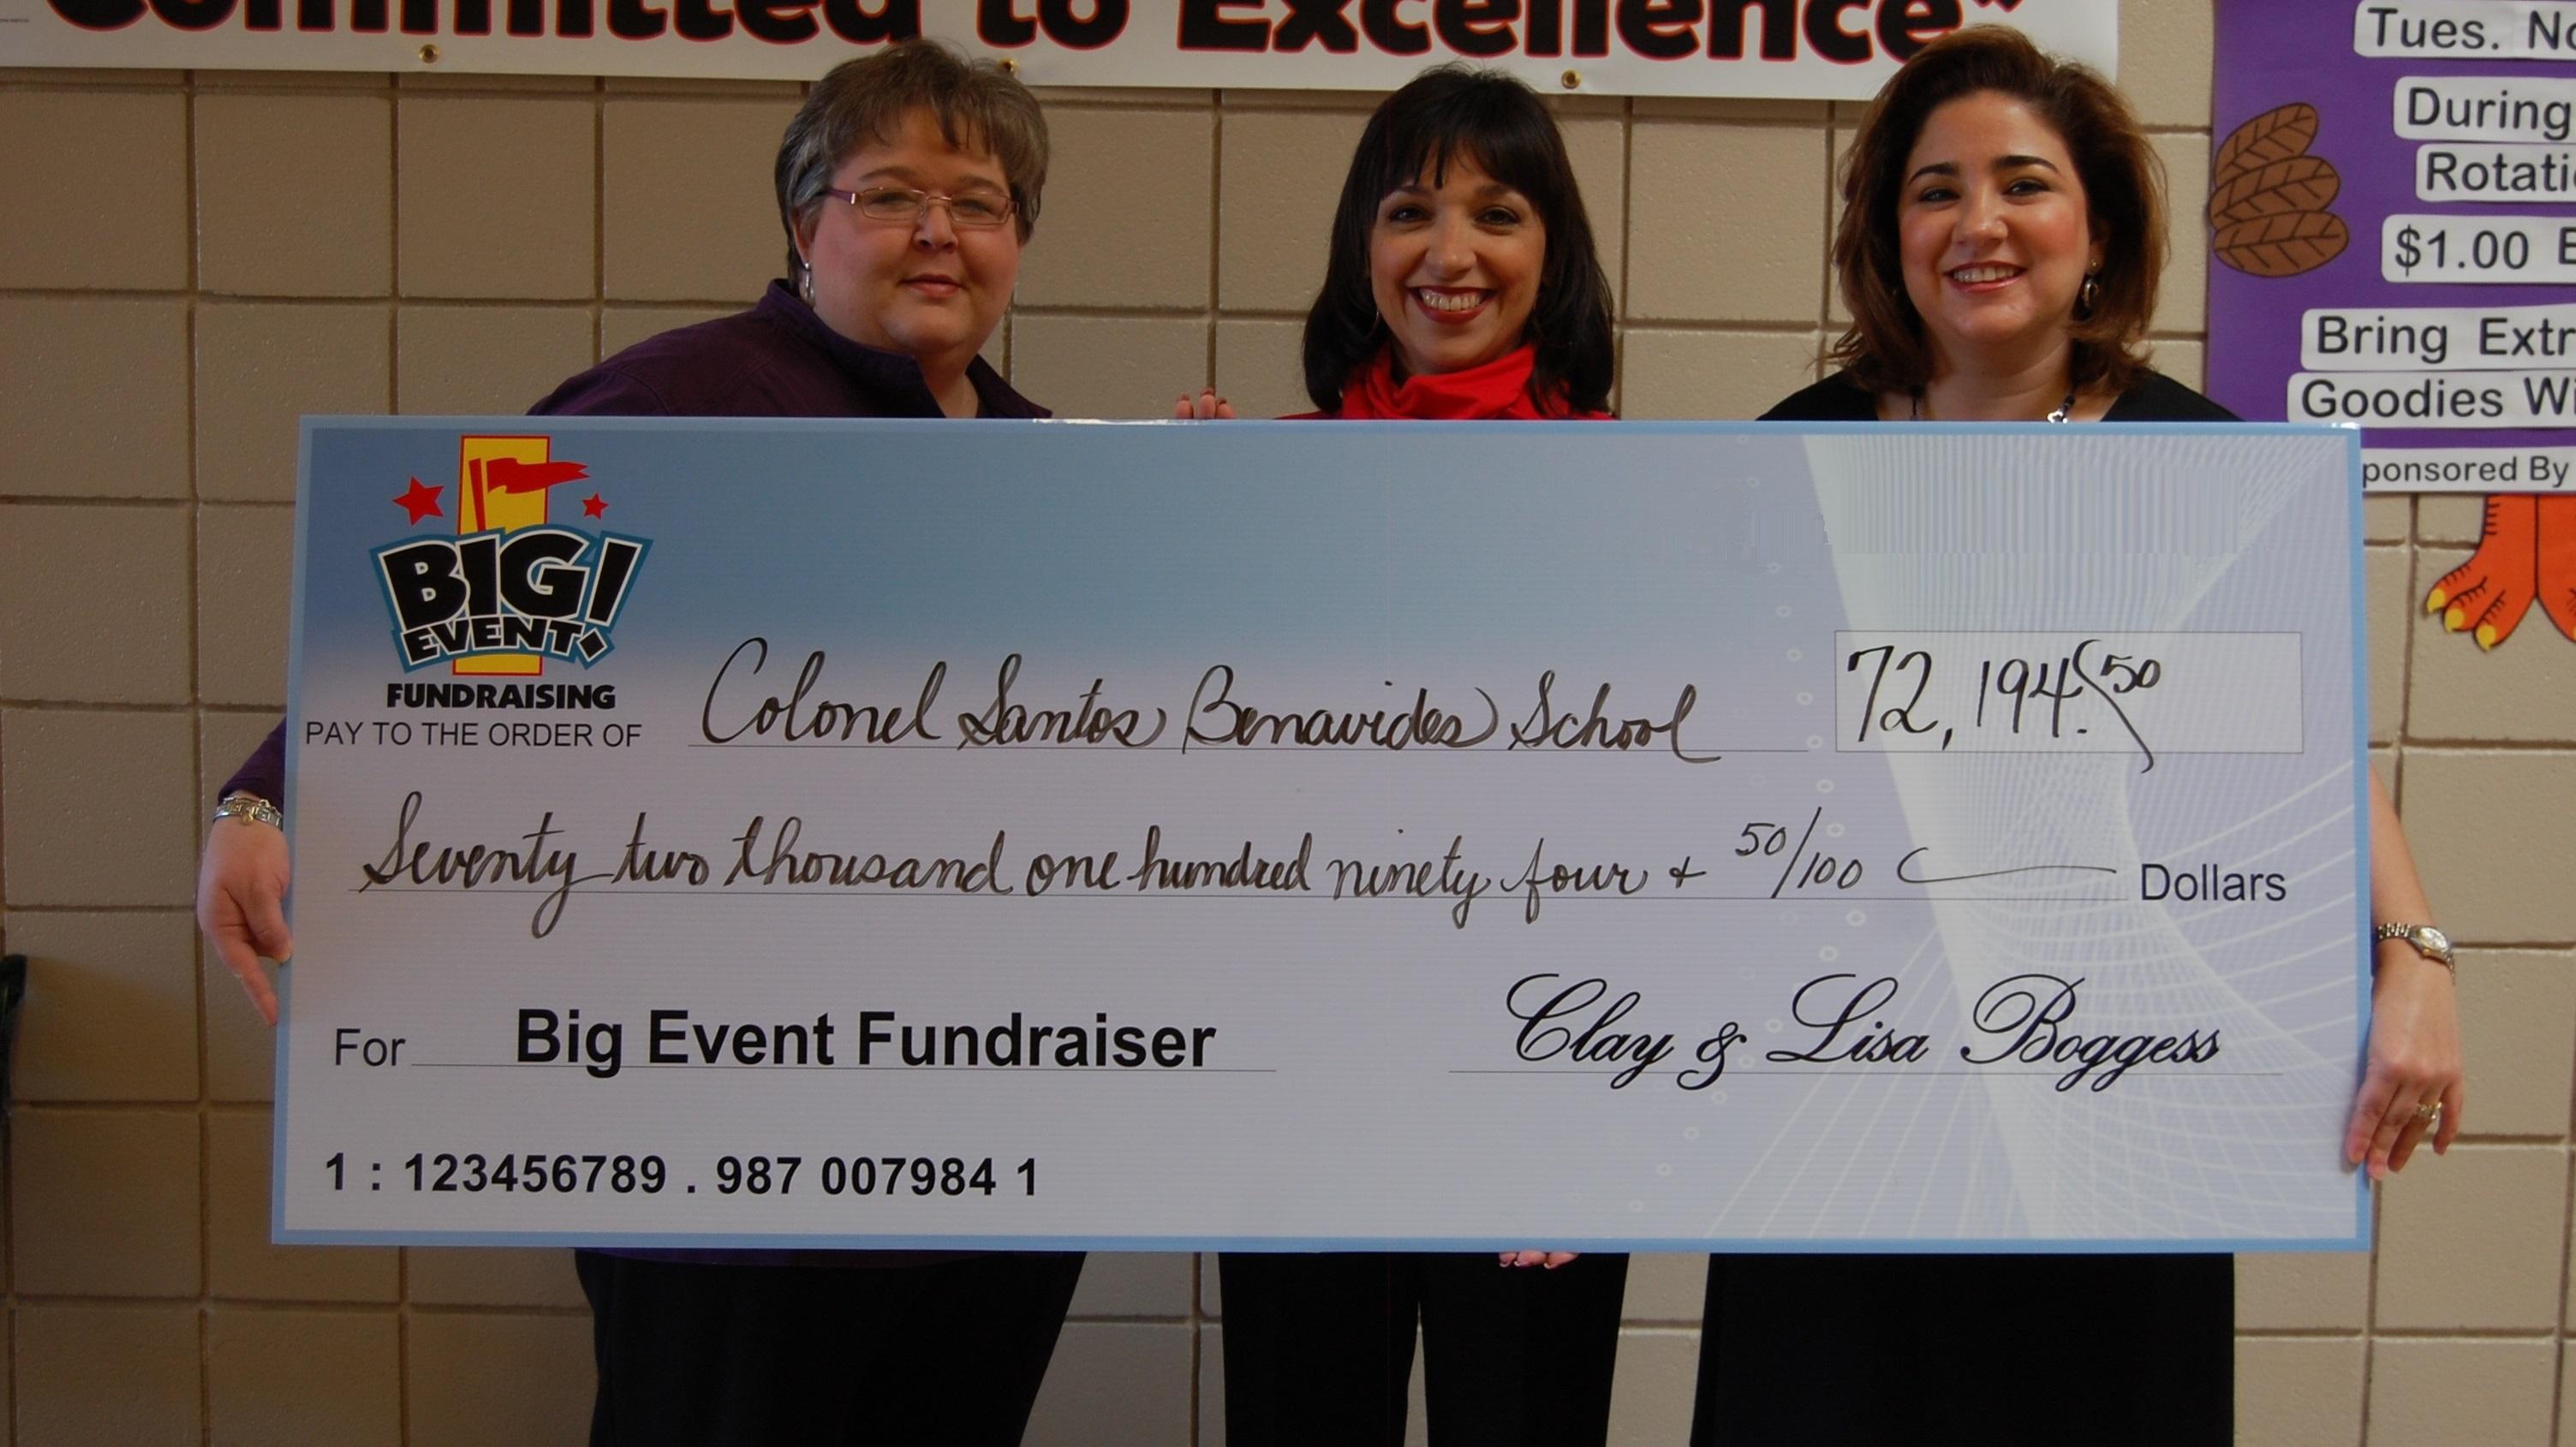 Col. Santos Benavides School fundraising team holding check